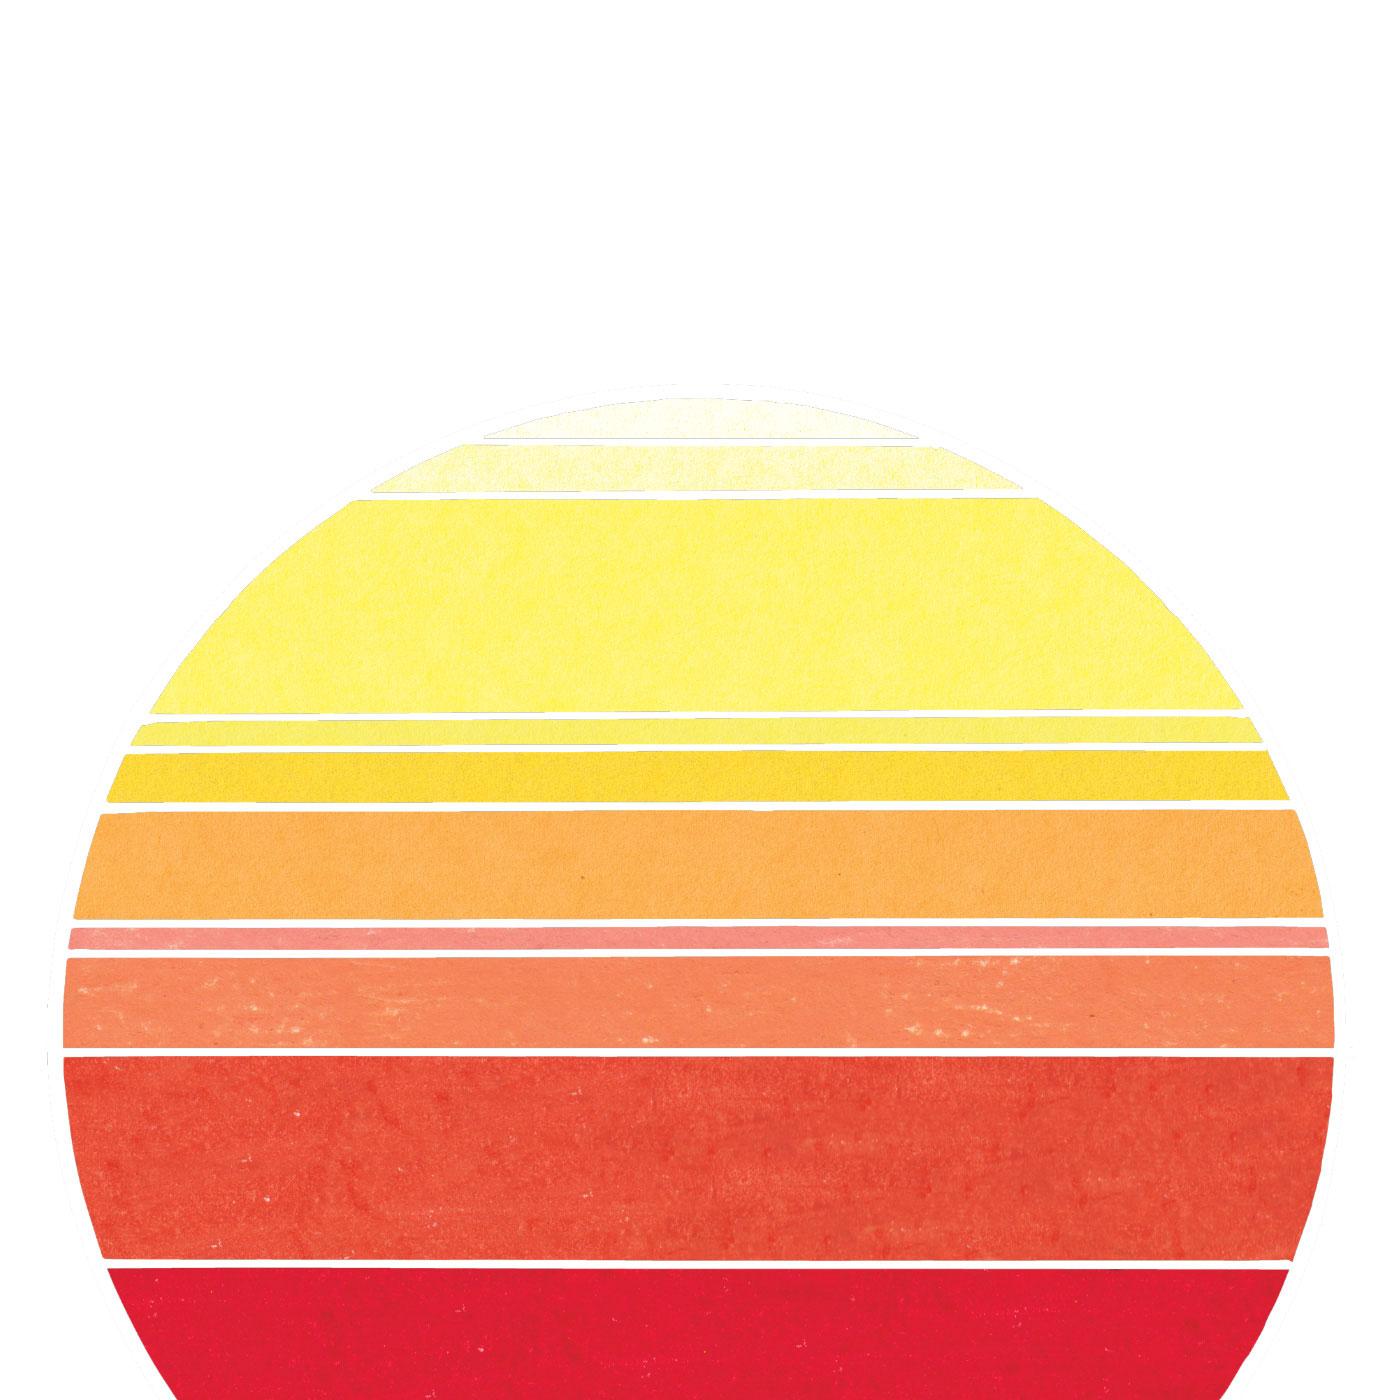 Sun Machine  (2018); Photoshop edited illustration, colored pencil & construction paper